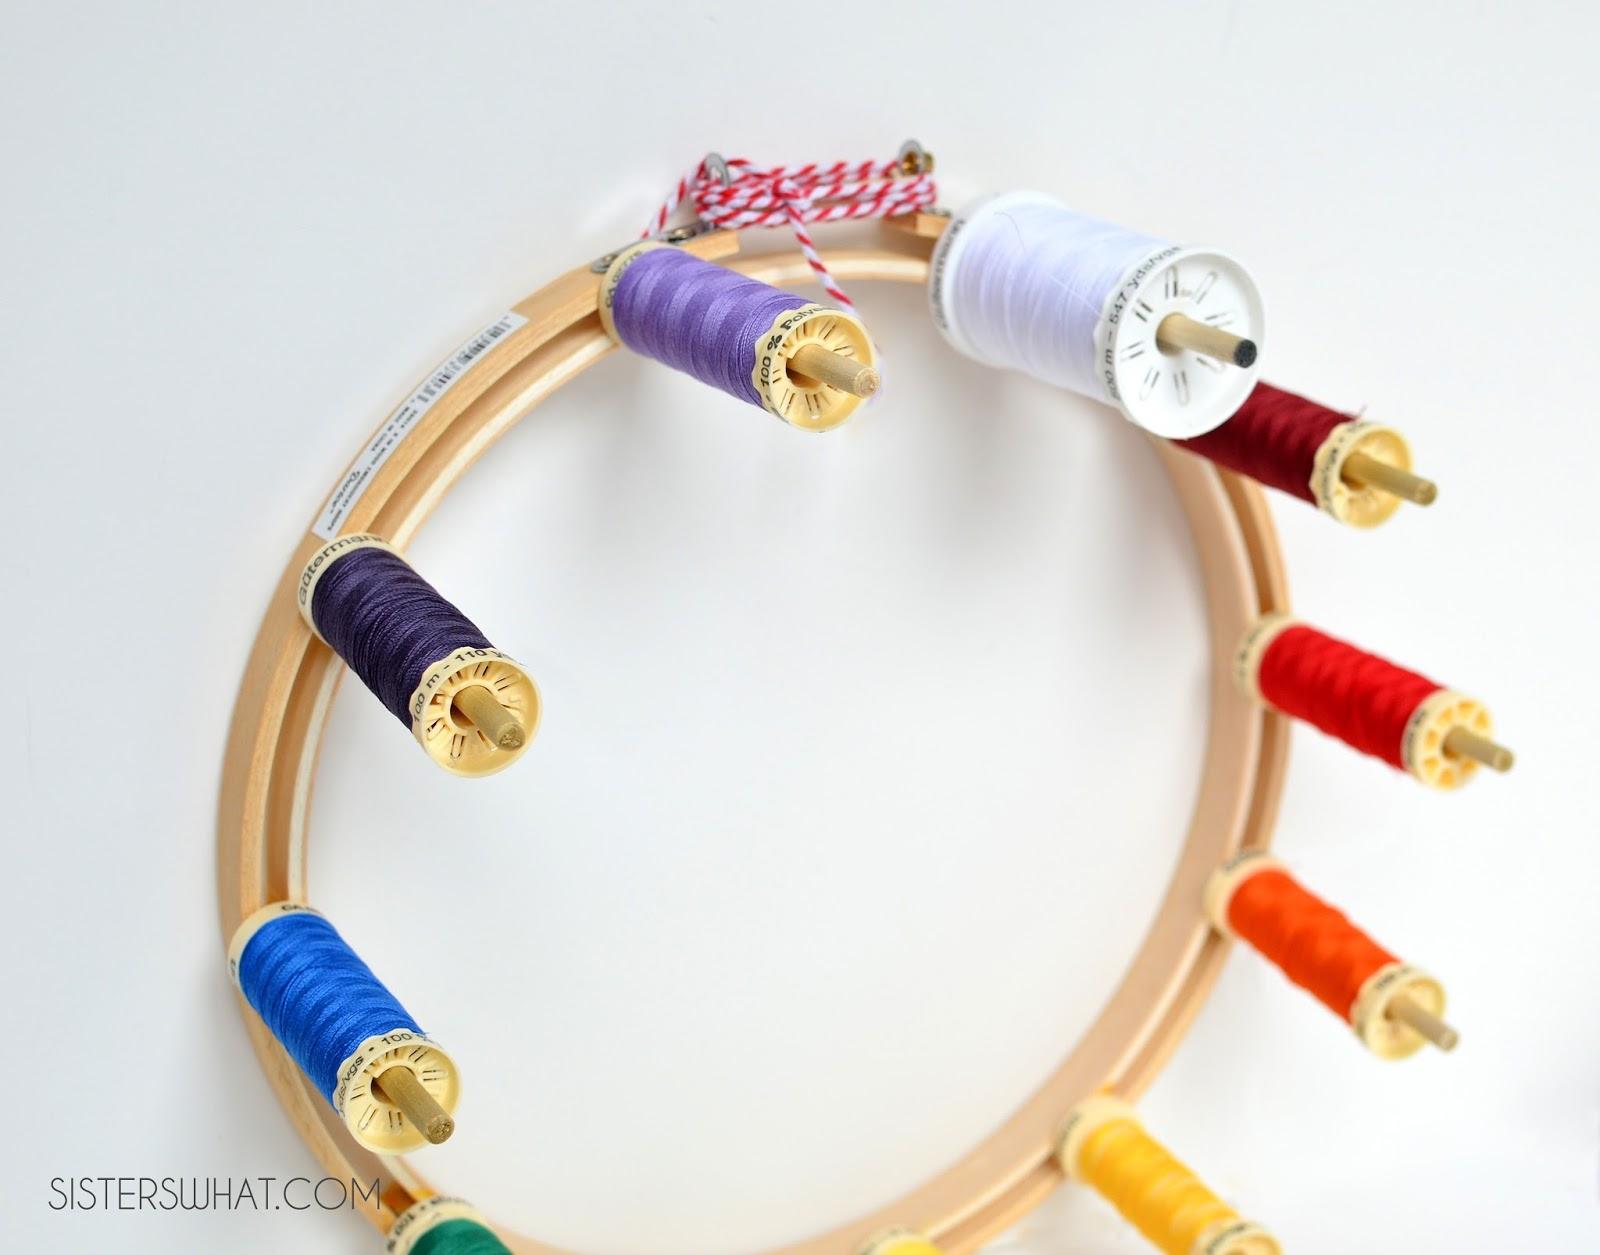 Embroidery hoop thread organizer february pinterest